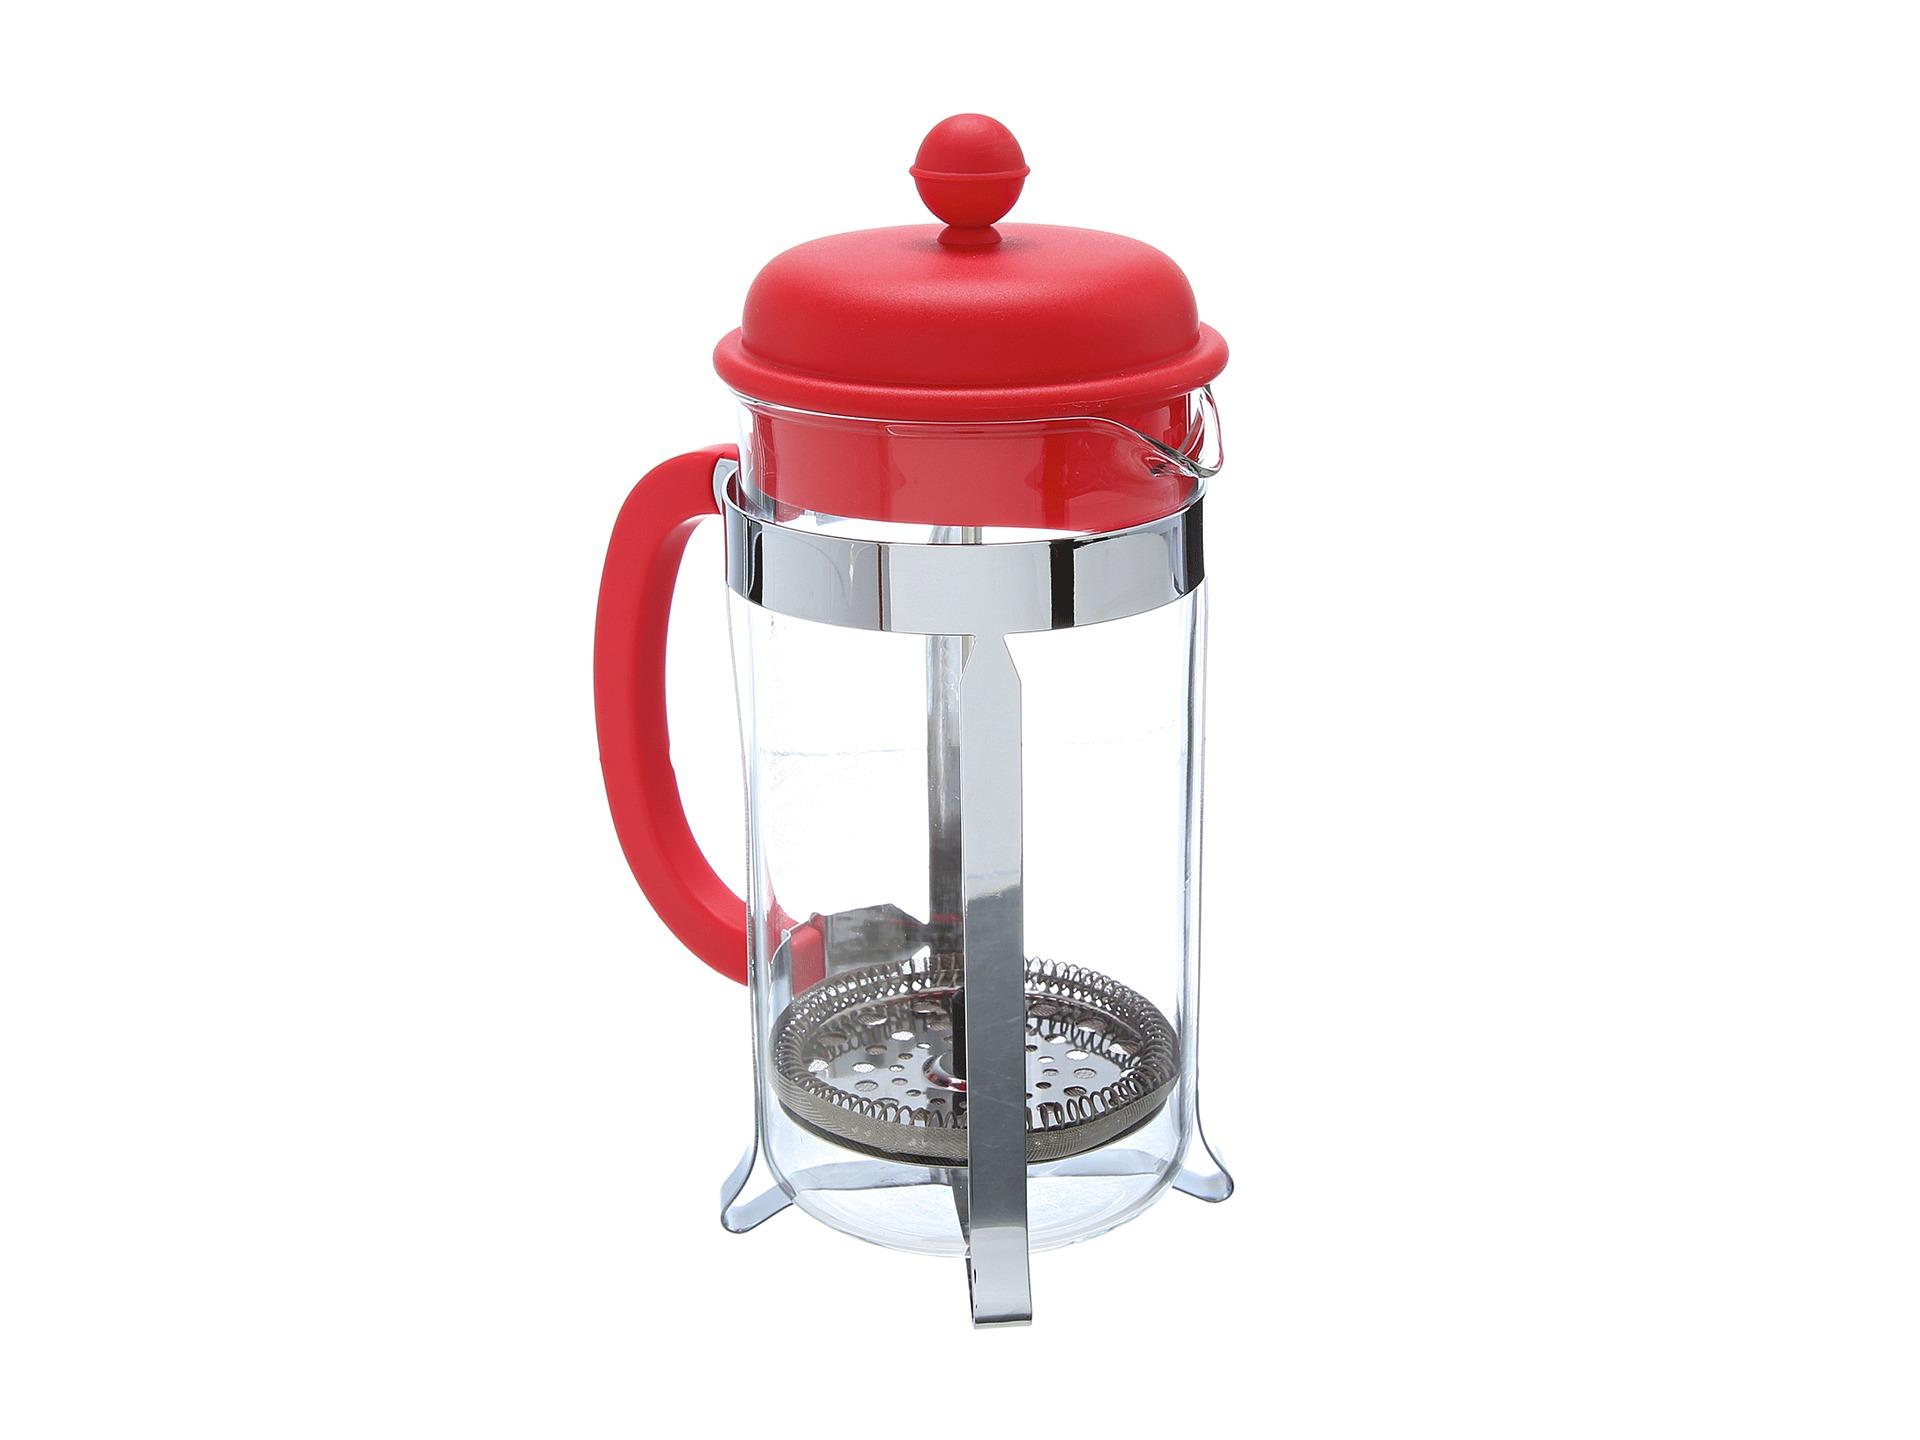 bodum caffettiera french press coffeemaker 34 oz shipped free at zappos. Black Bedroom Furniture Sets. Home Design Ideas